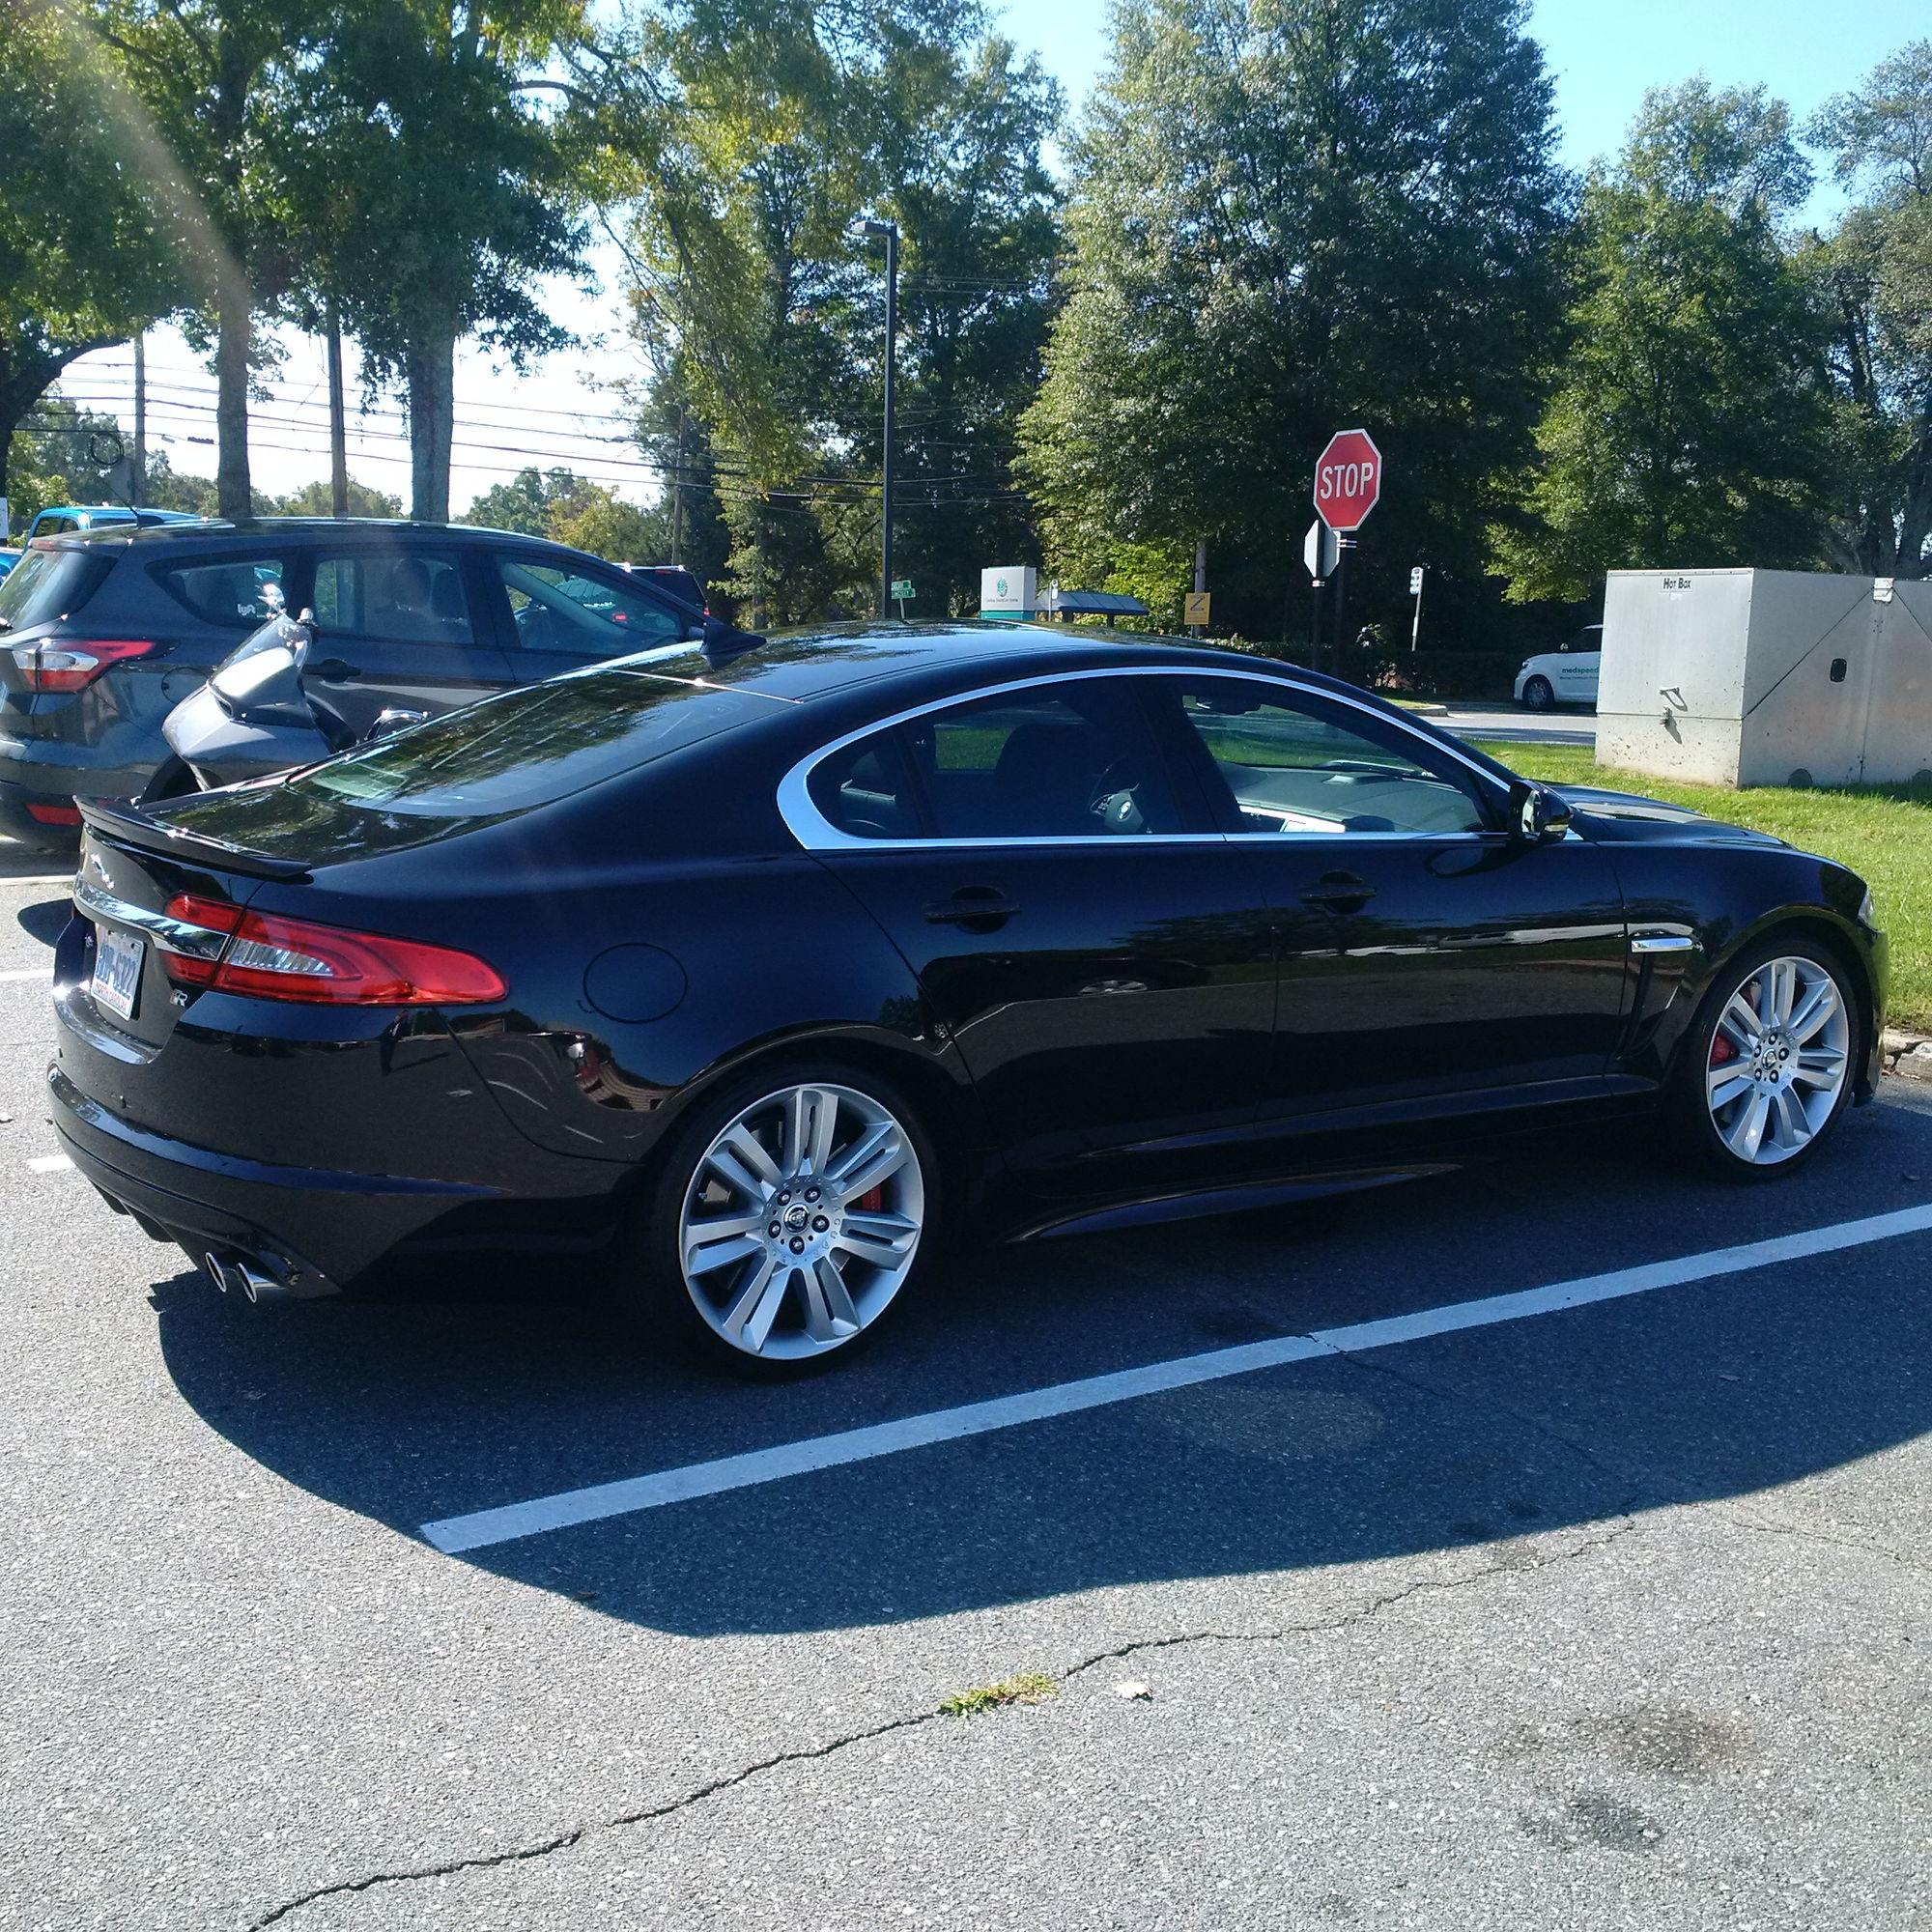 Xf Jaguar For Sale Used: FS [SouthEast]: 2013 Jaguar XF-R Ultra Low Miles